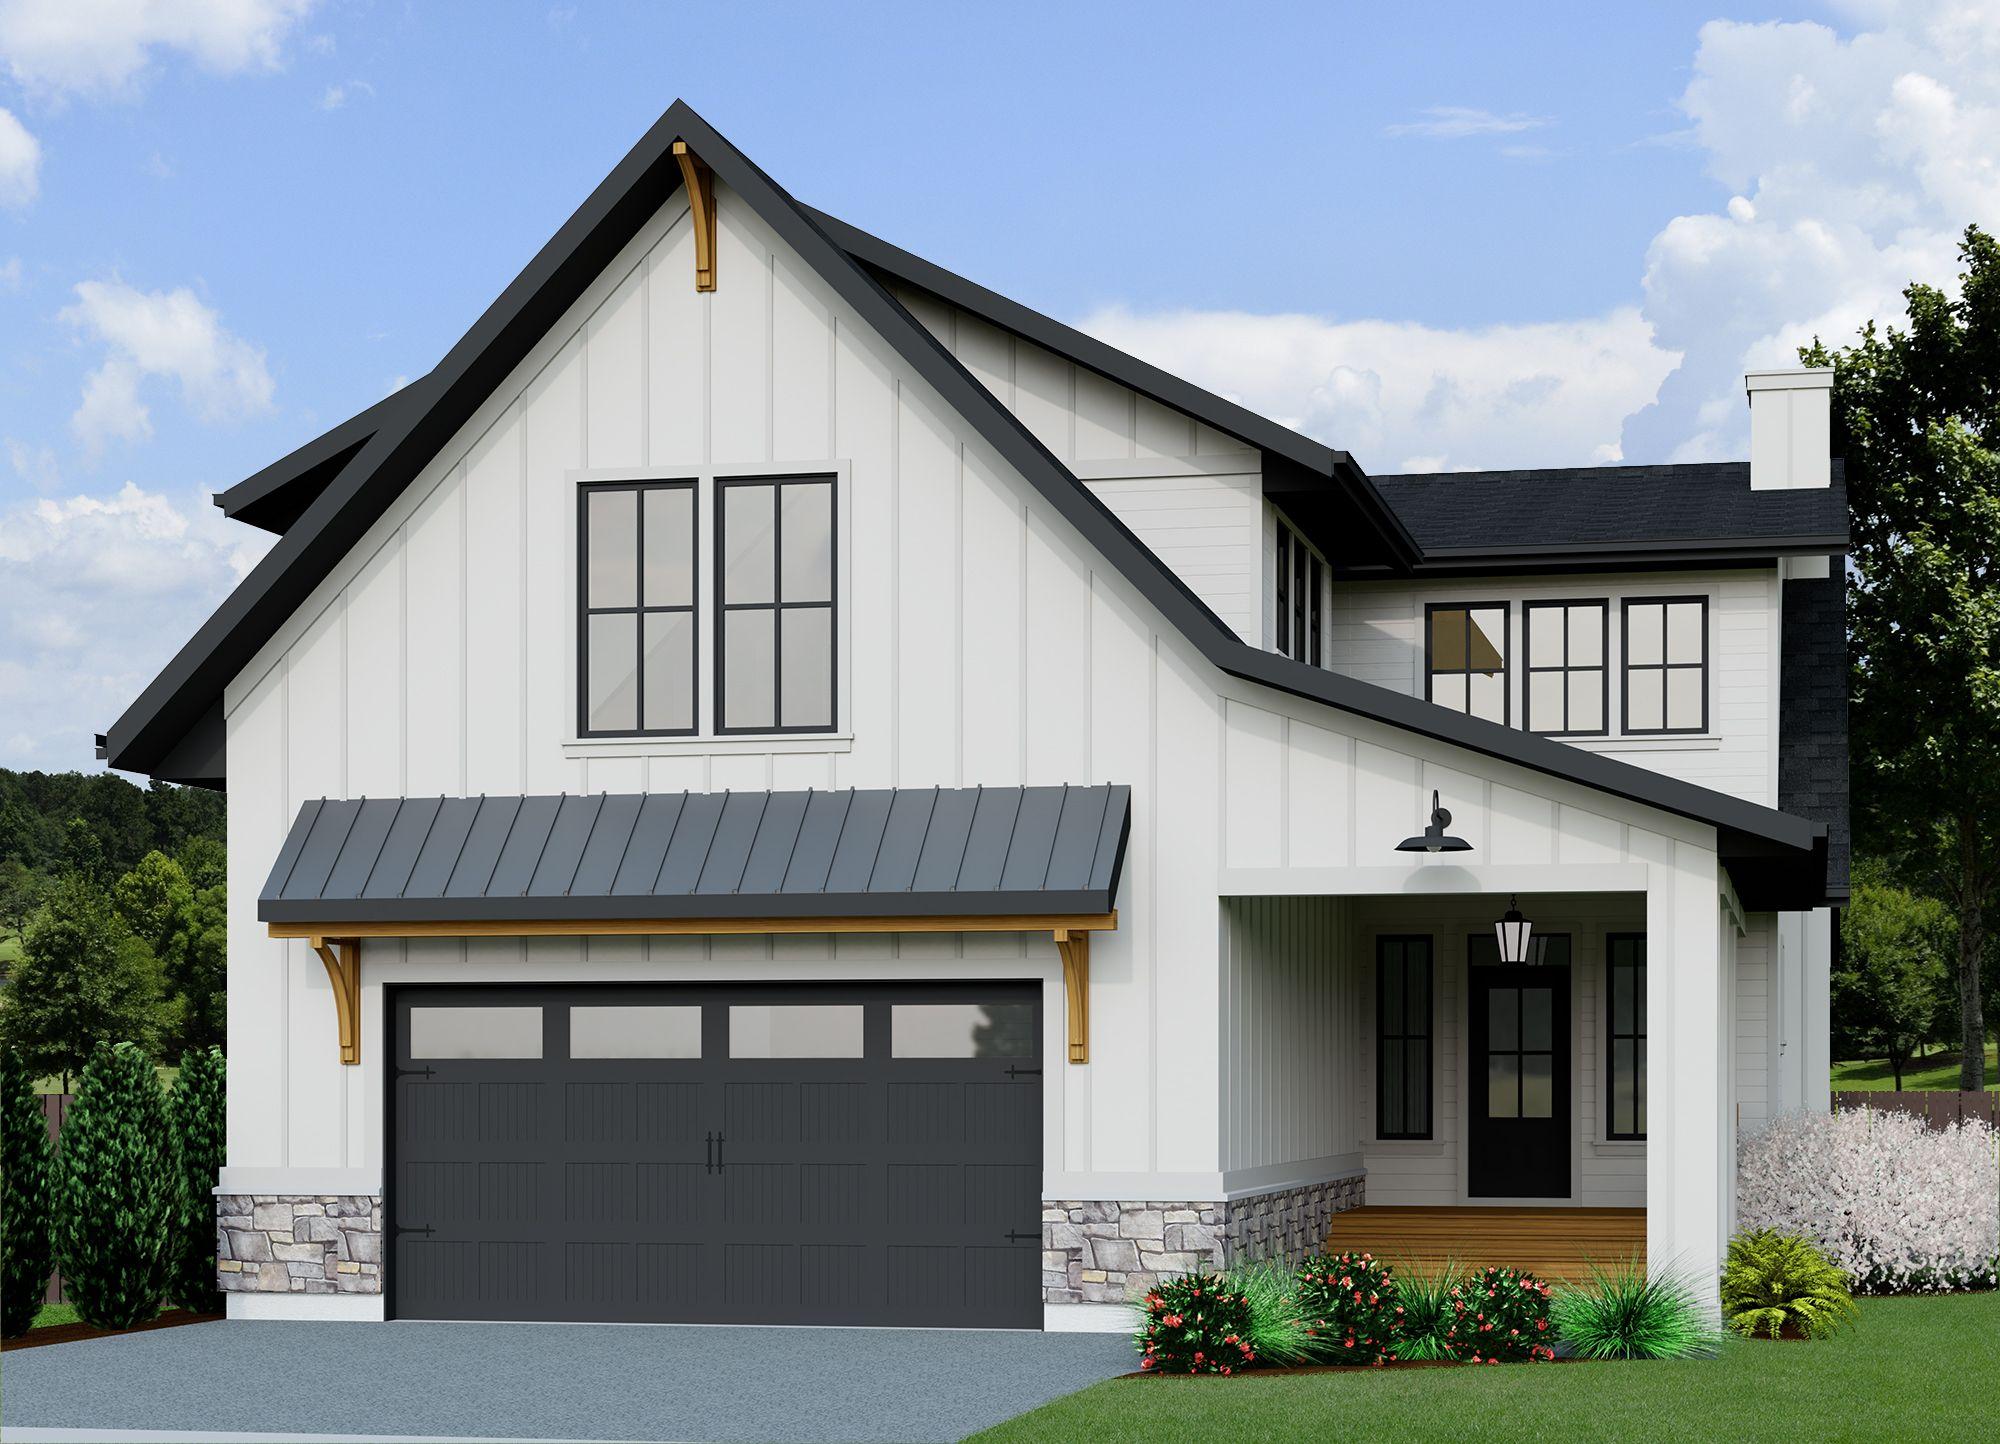 Modern Farmhouse Vantage-2484 in 2020 | Modern farmhouse ...